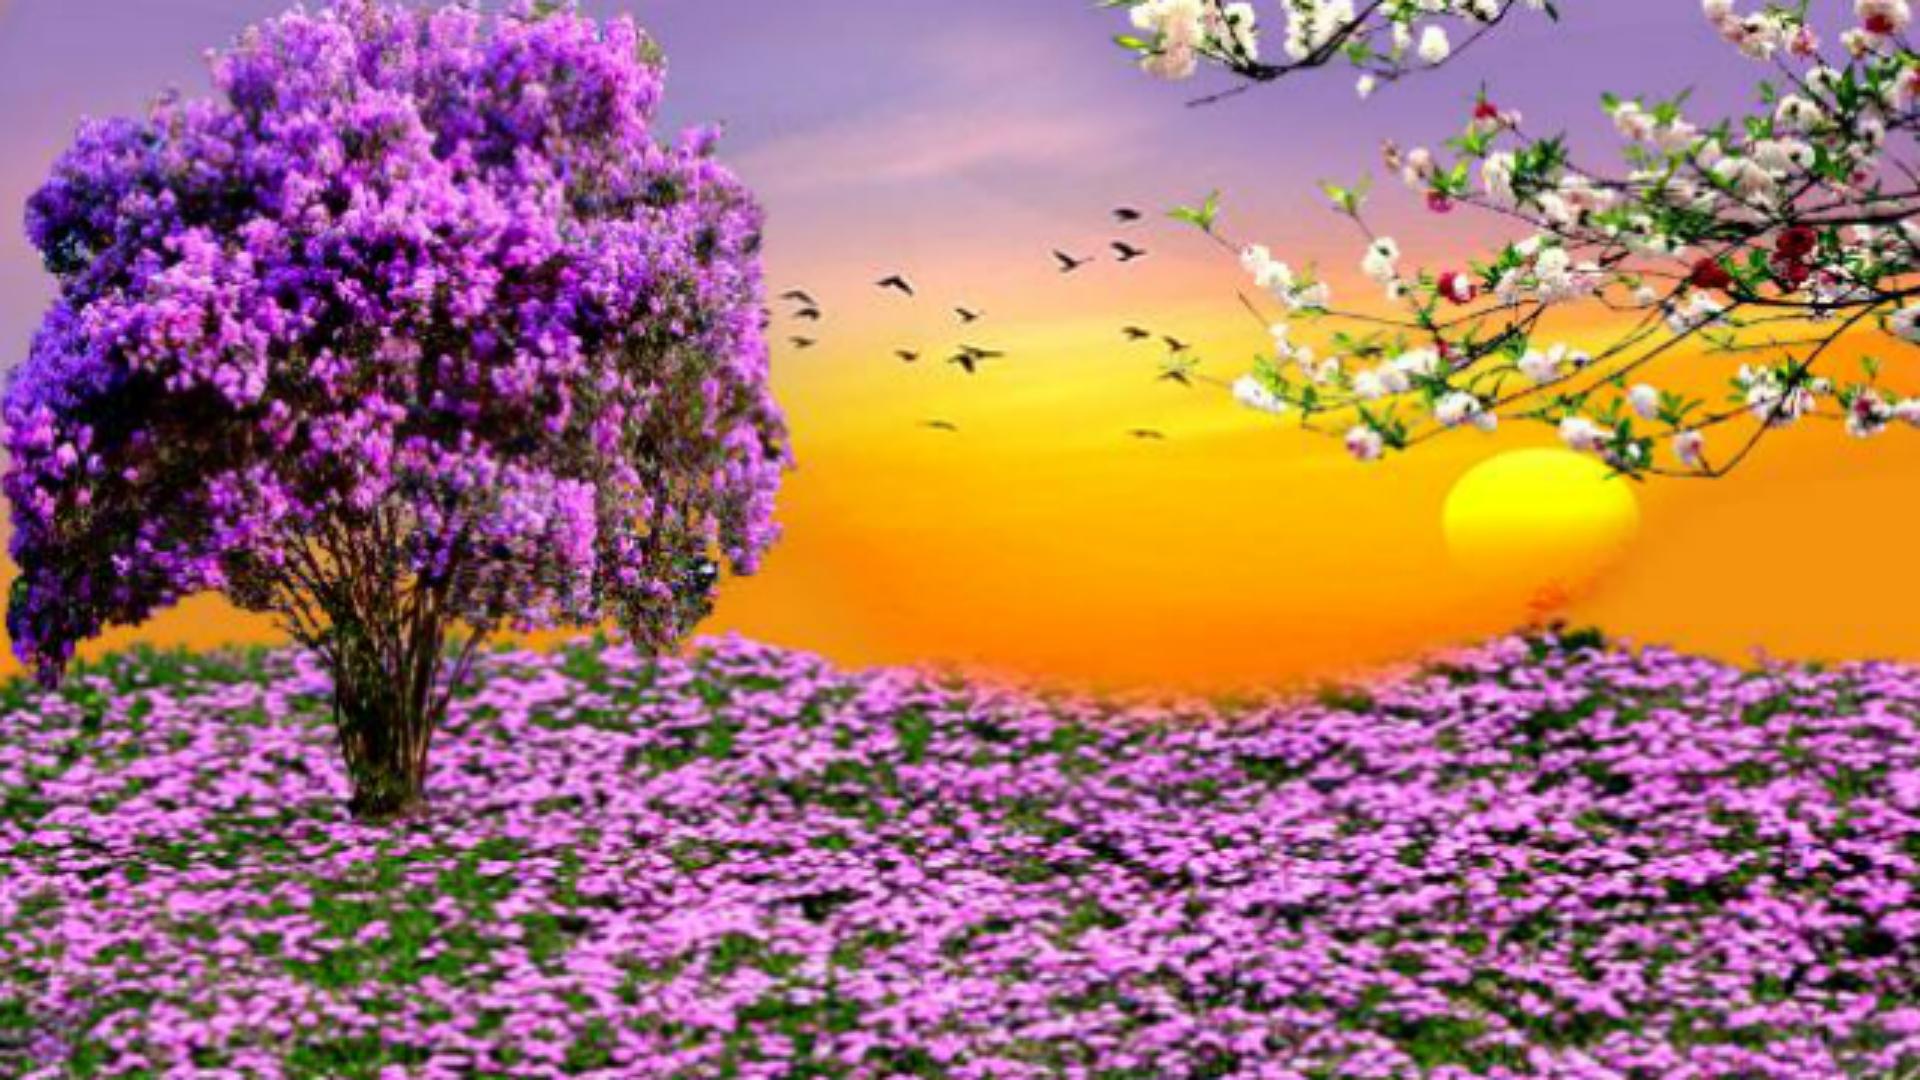 WallpapersWidecom Flowers HD Desktop Wallpapers for 4K